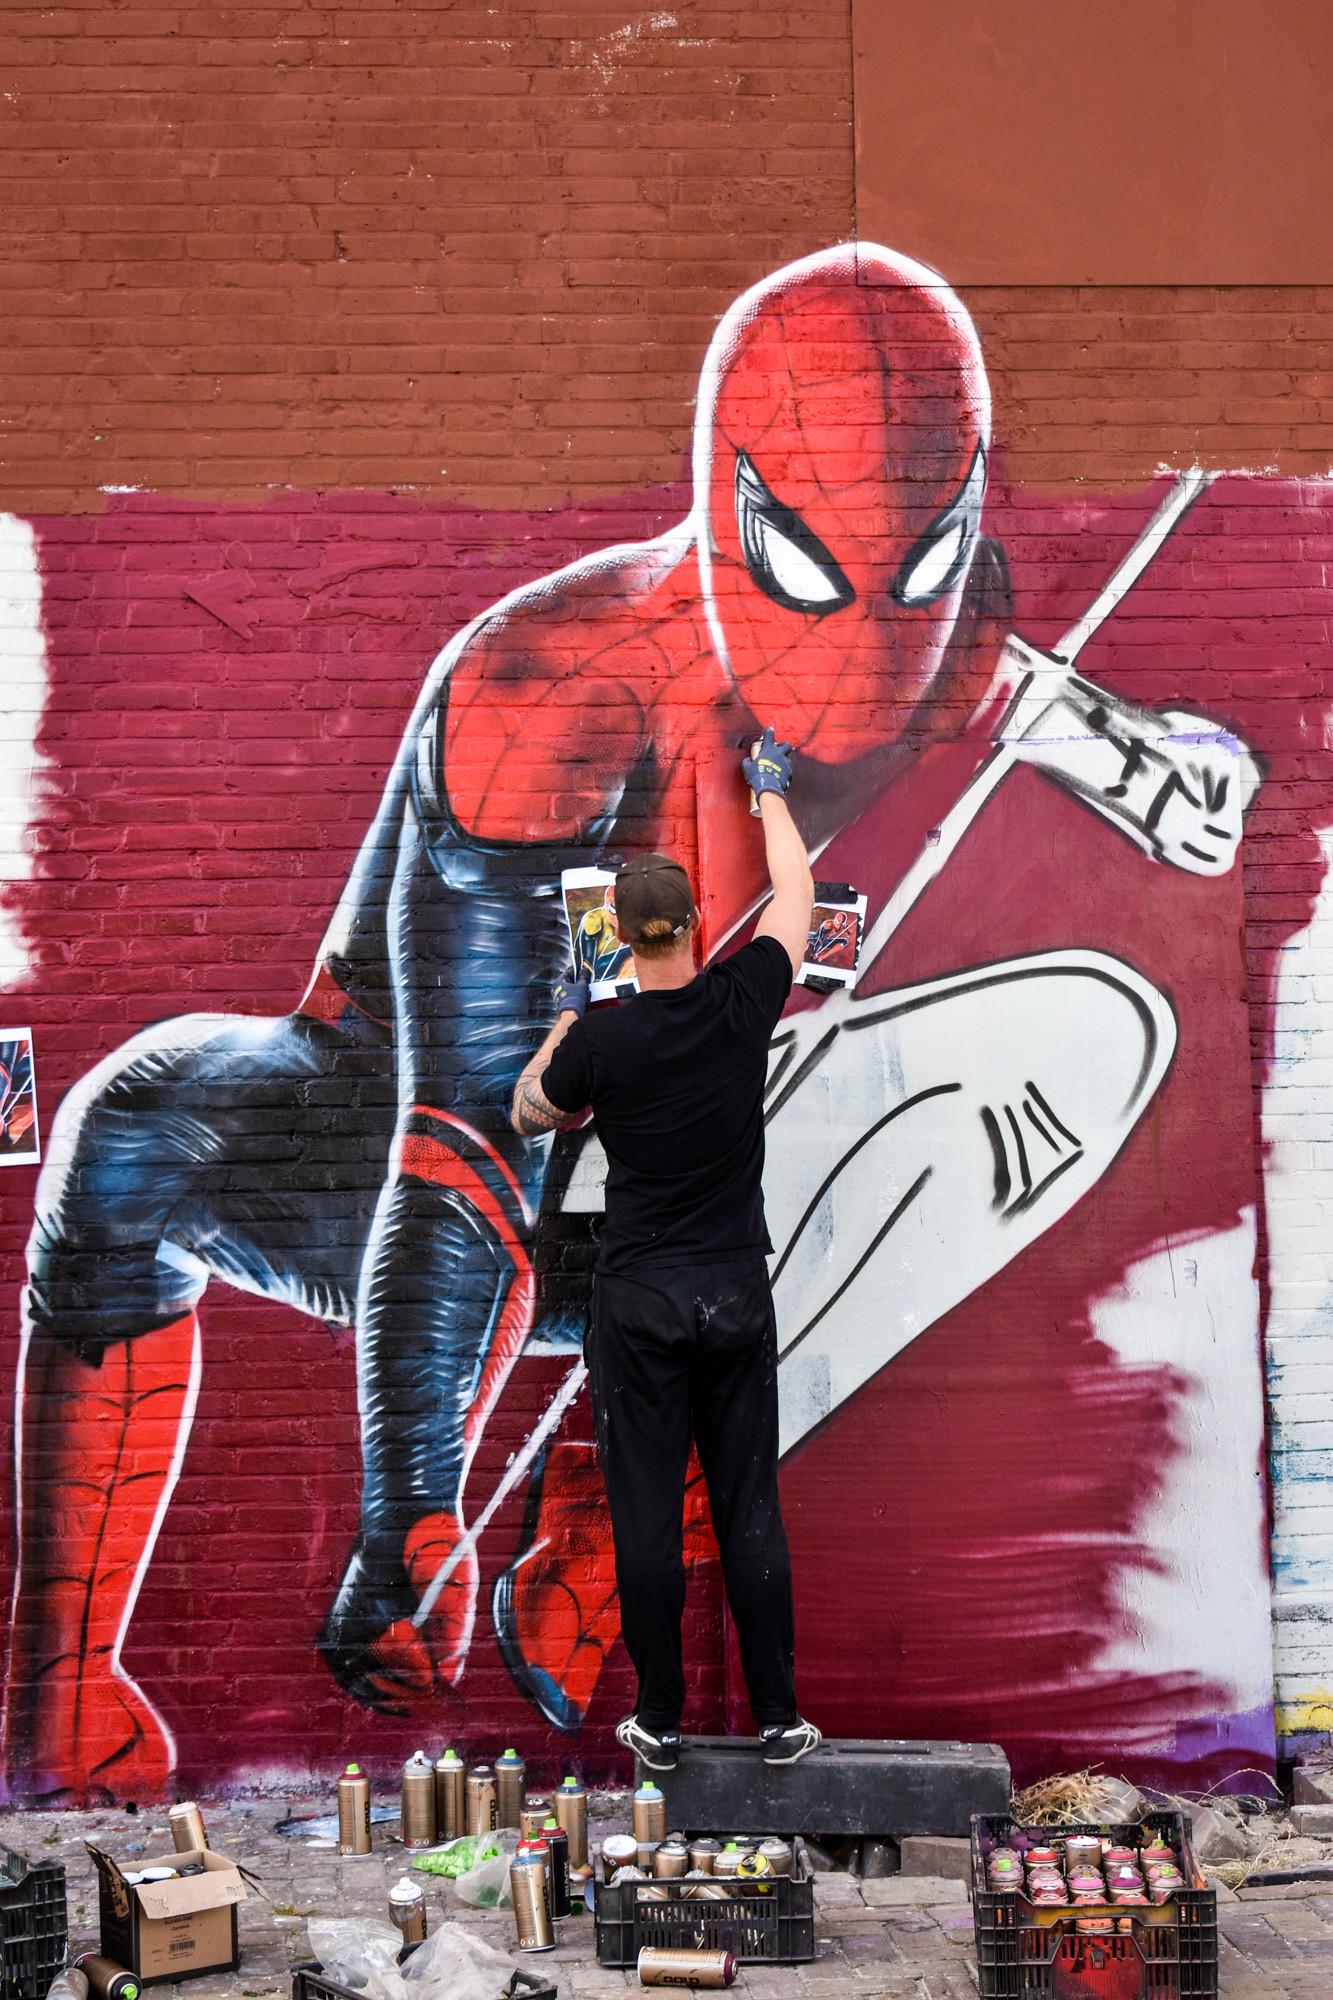 Graffiti wall art artist painting in Amsterdam